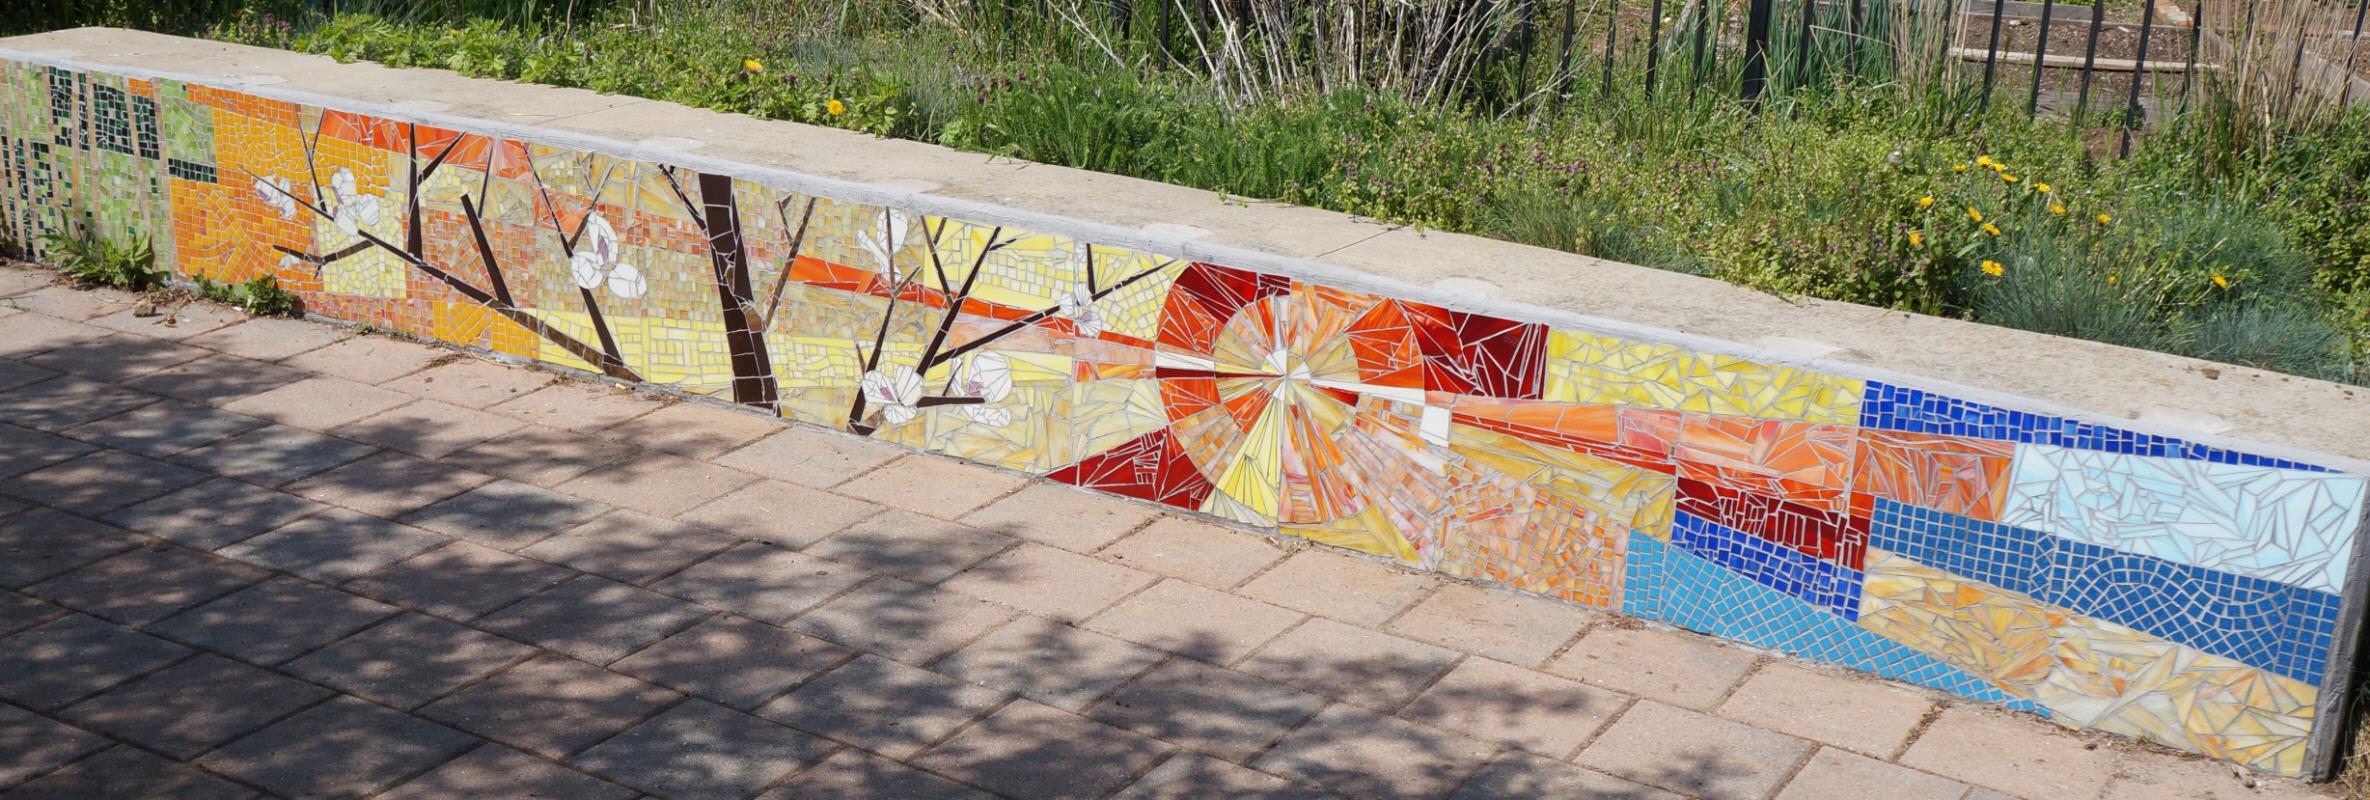 Philadelphia Public Art Summer Winter Community Garden Mosaic